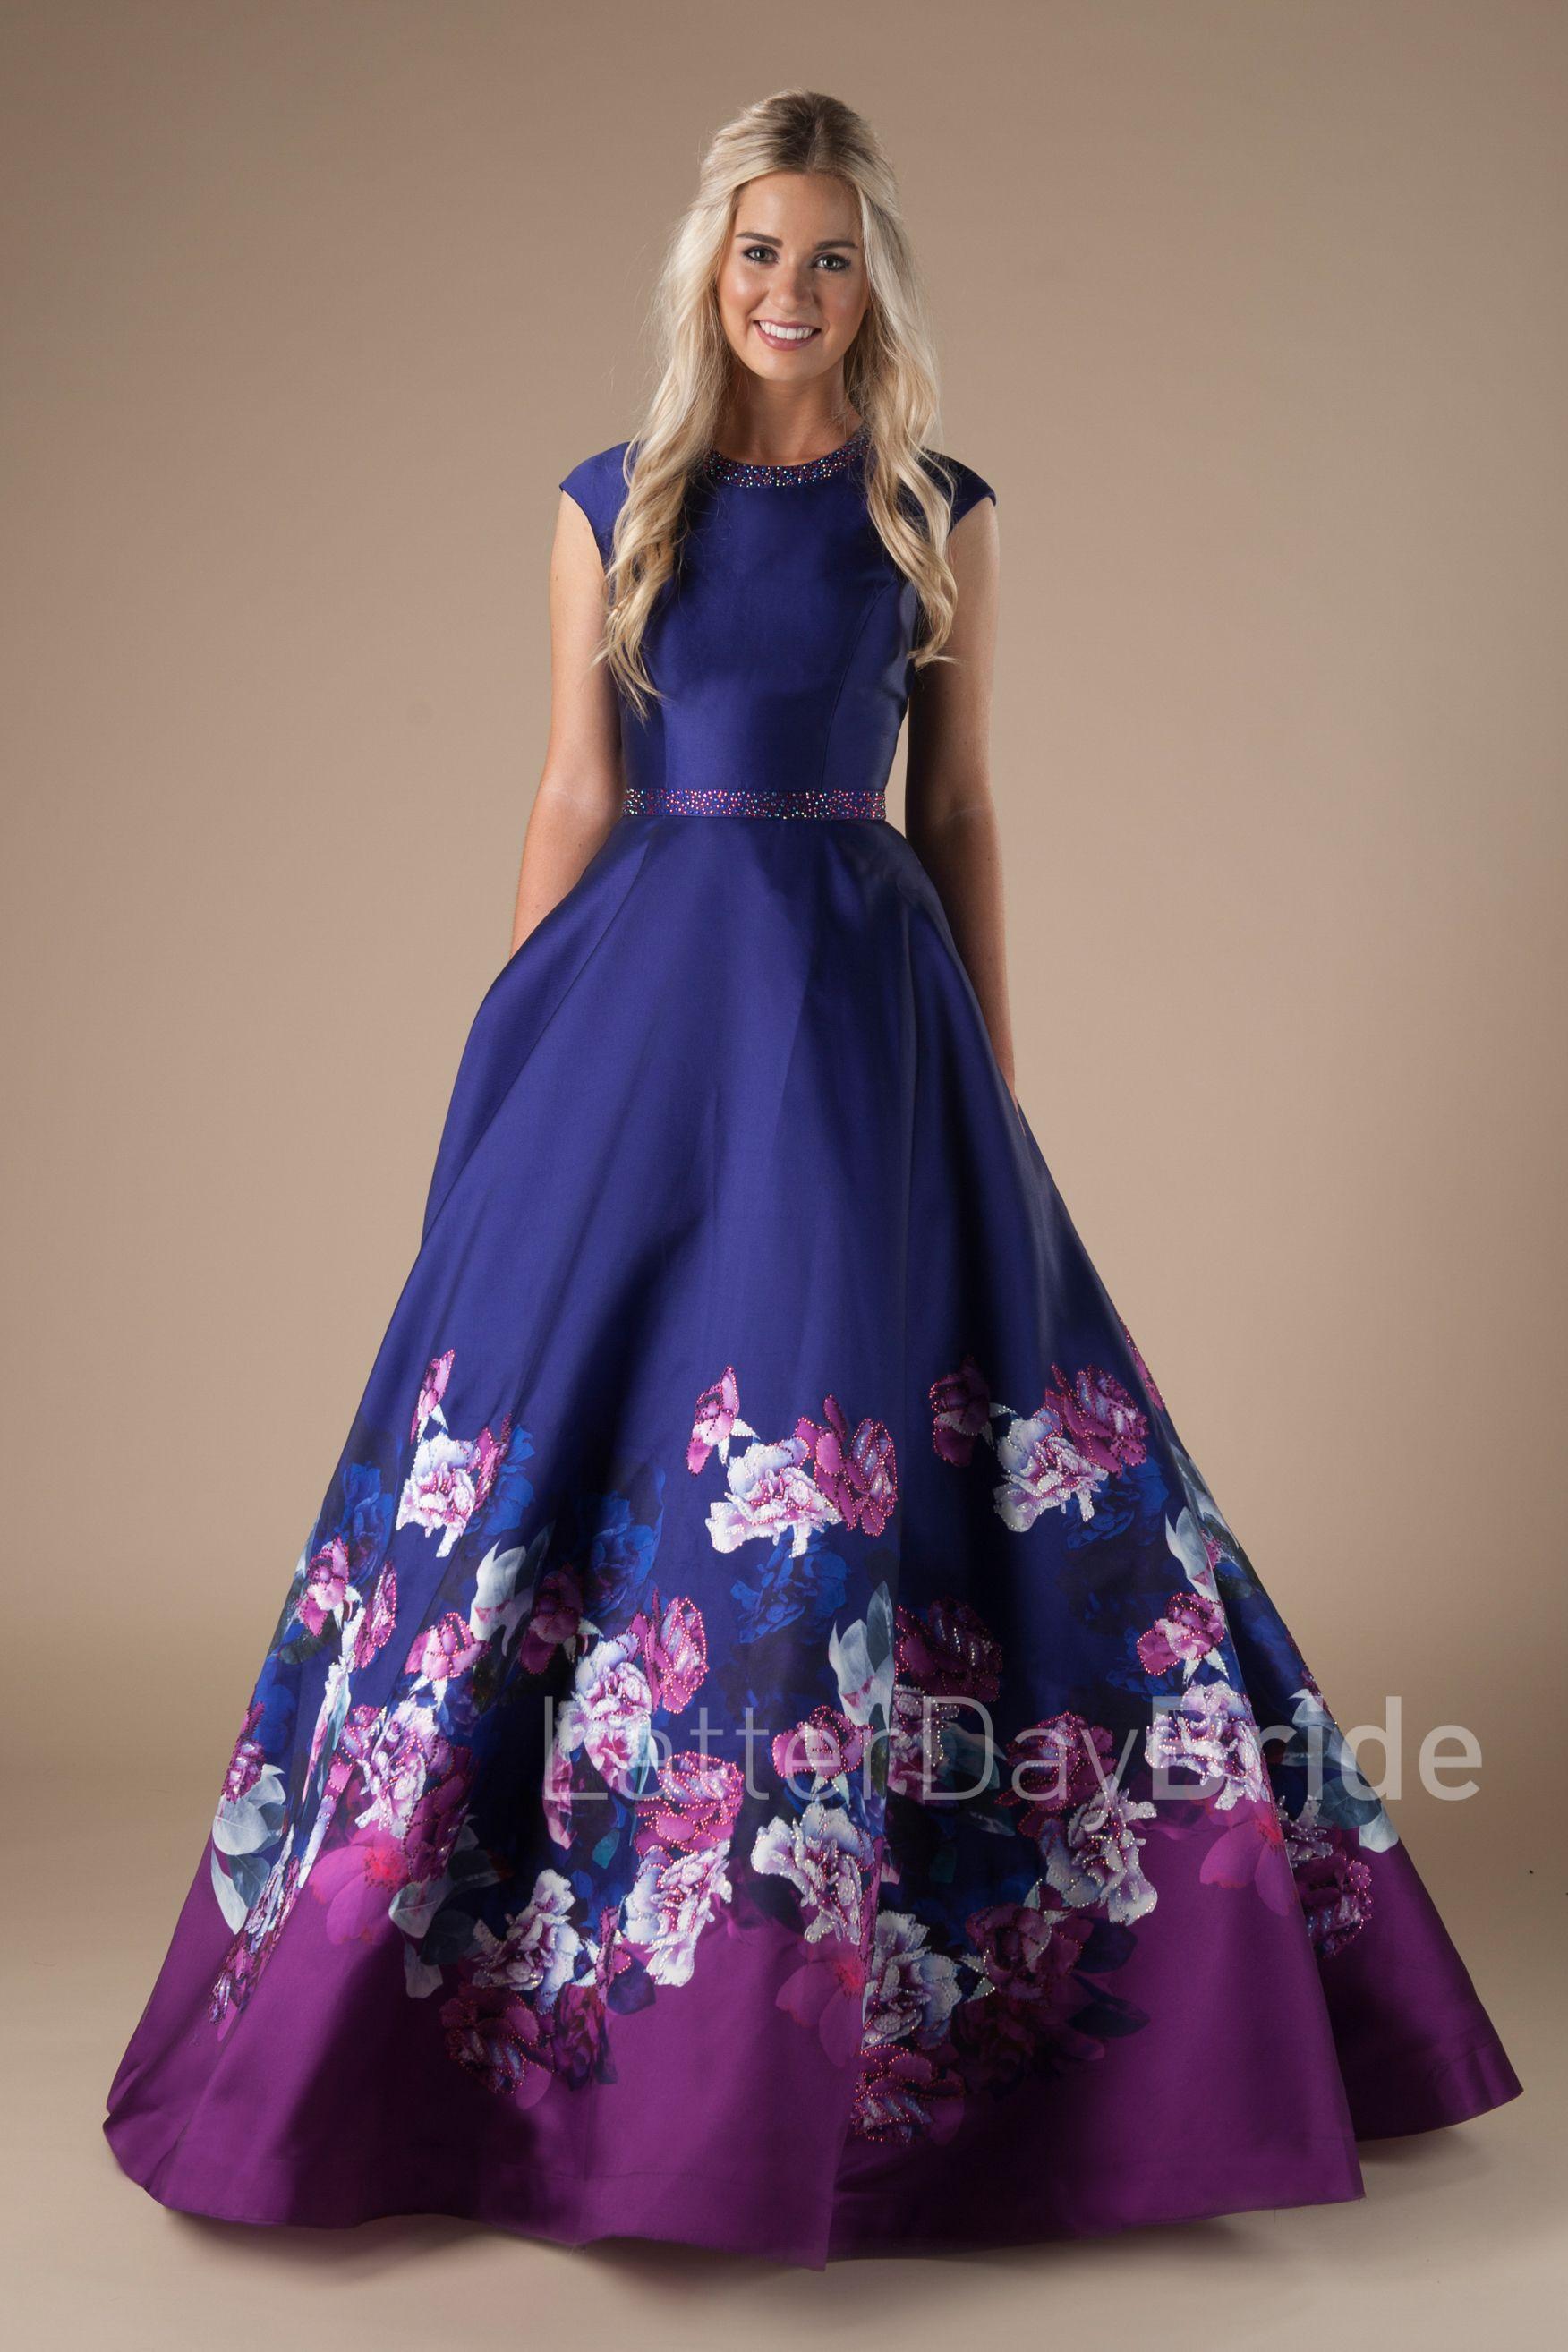 Saylor | moda fashion | Pinterest | Elegante, Trajes elegantes y ...